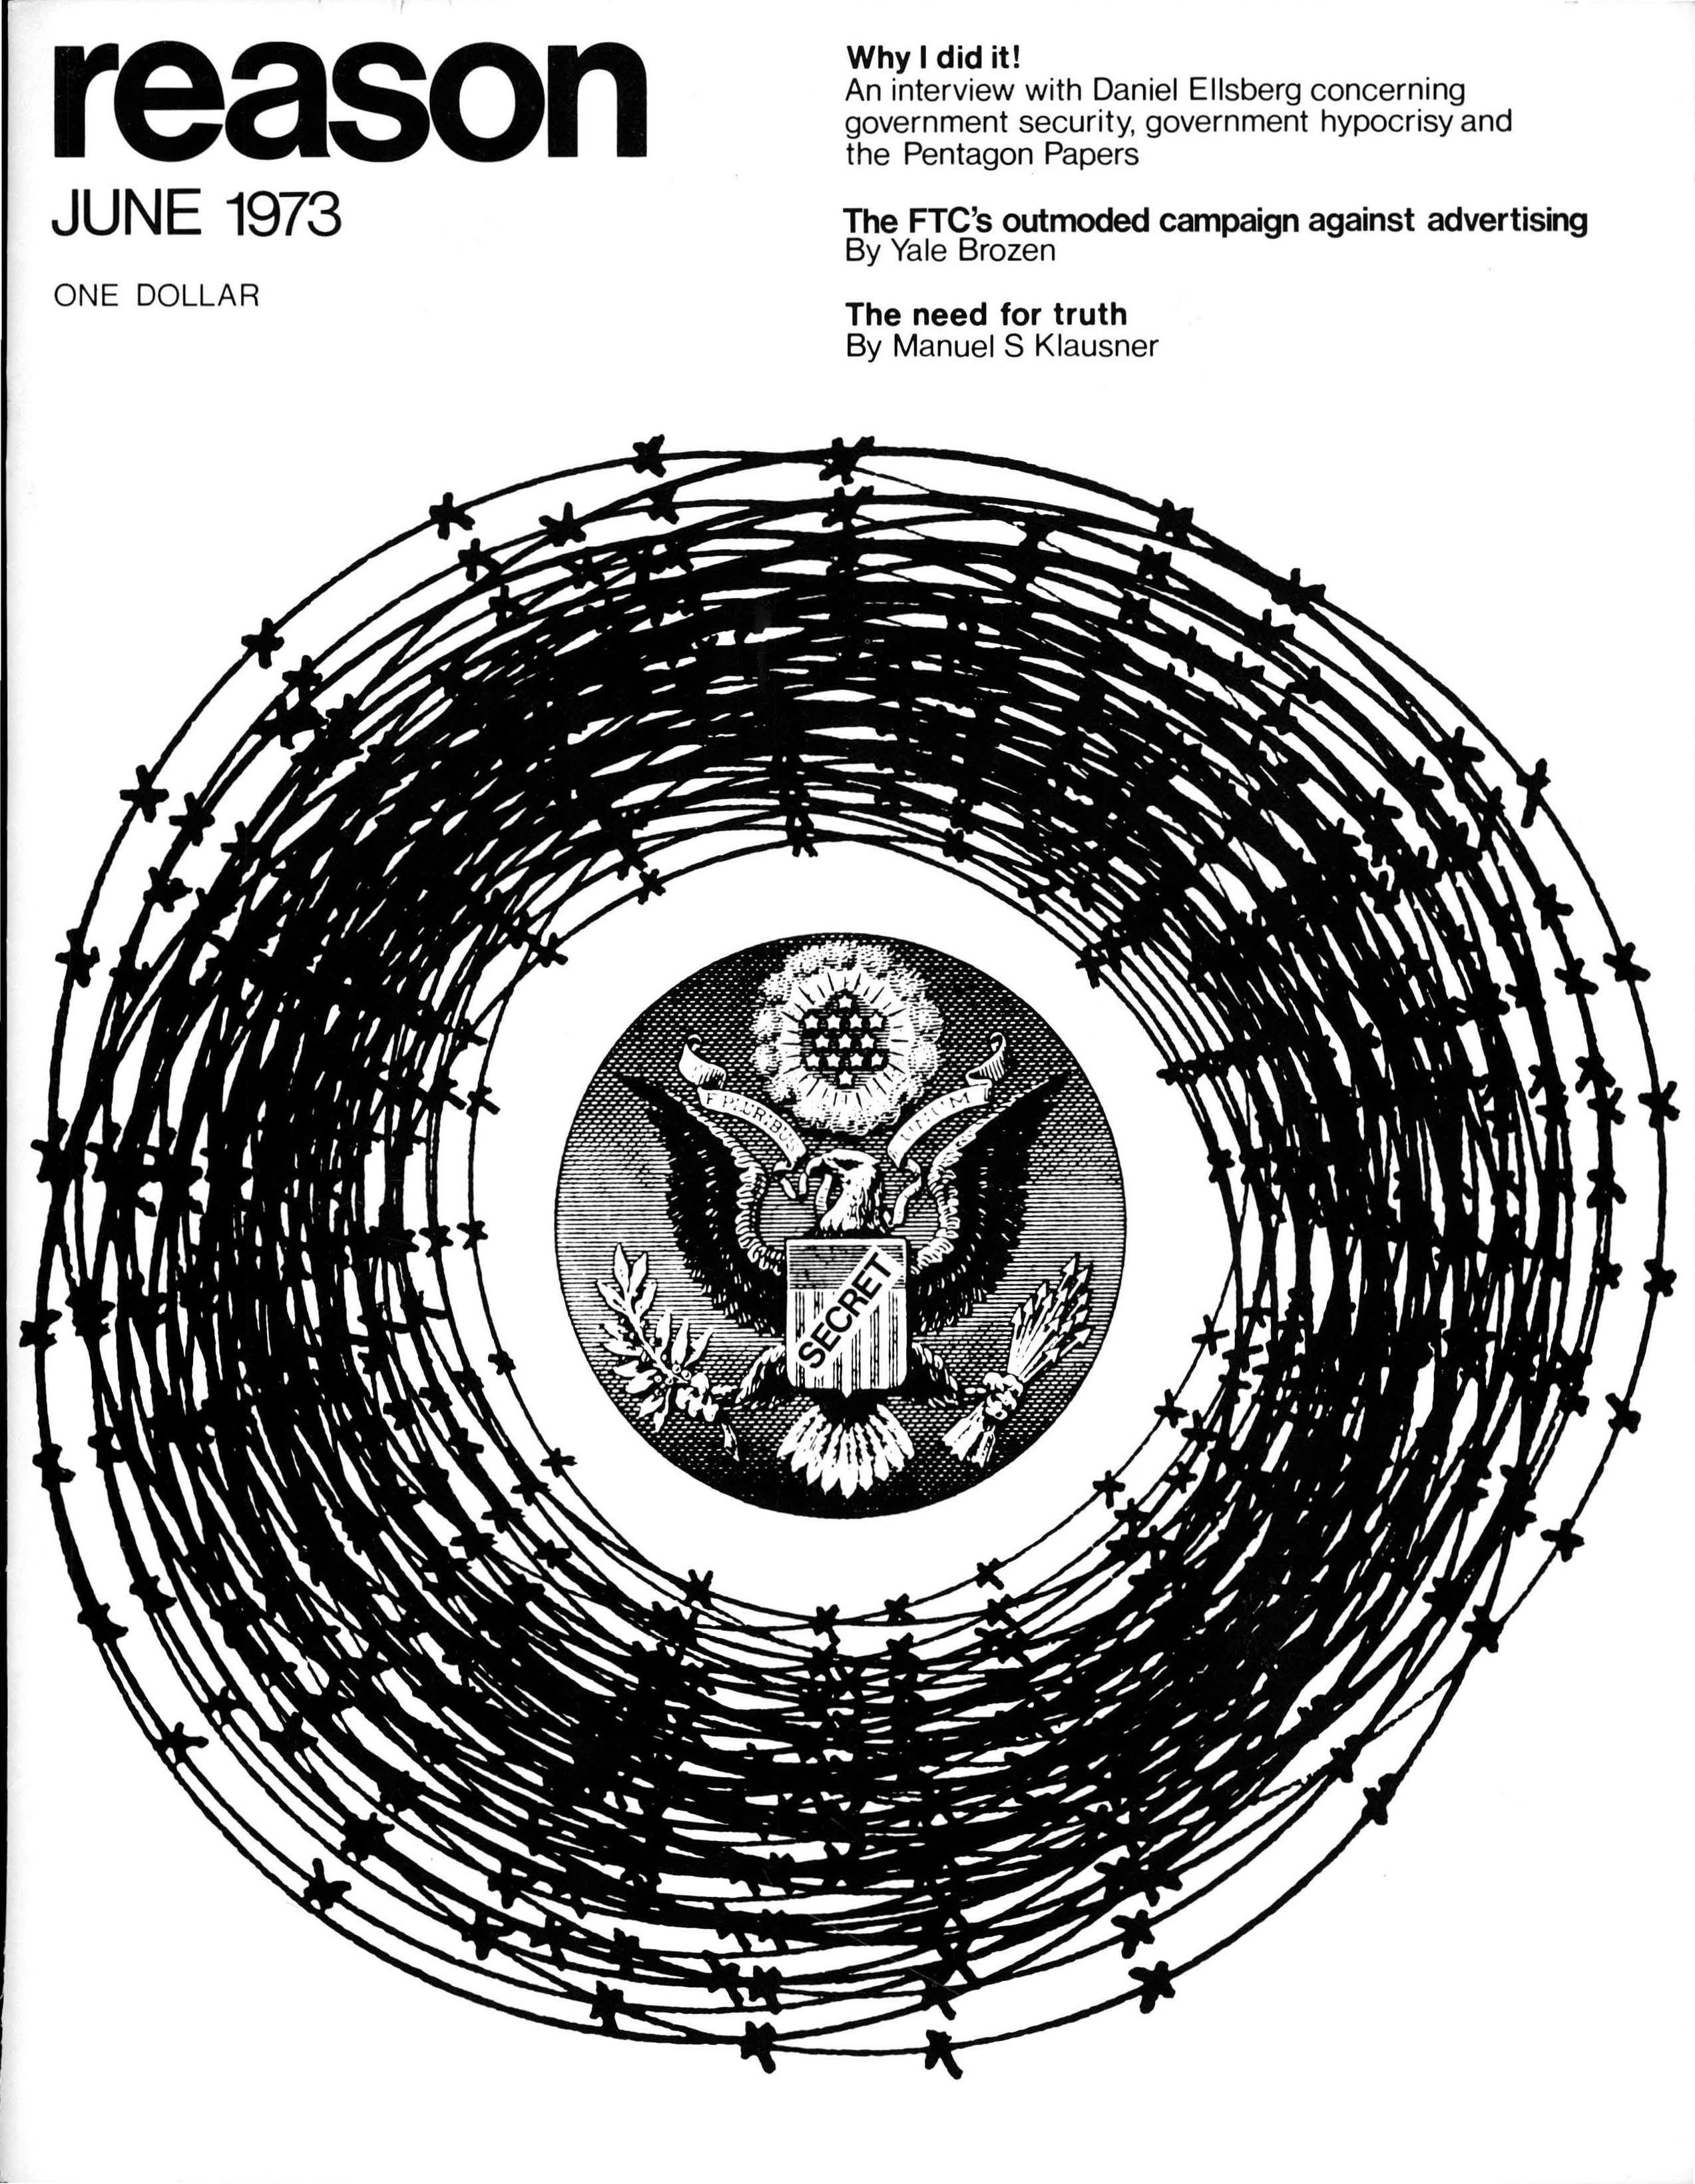 Reason Magazine, June 1973 cover image